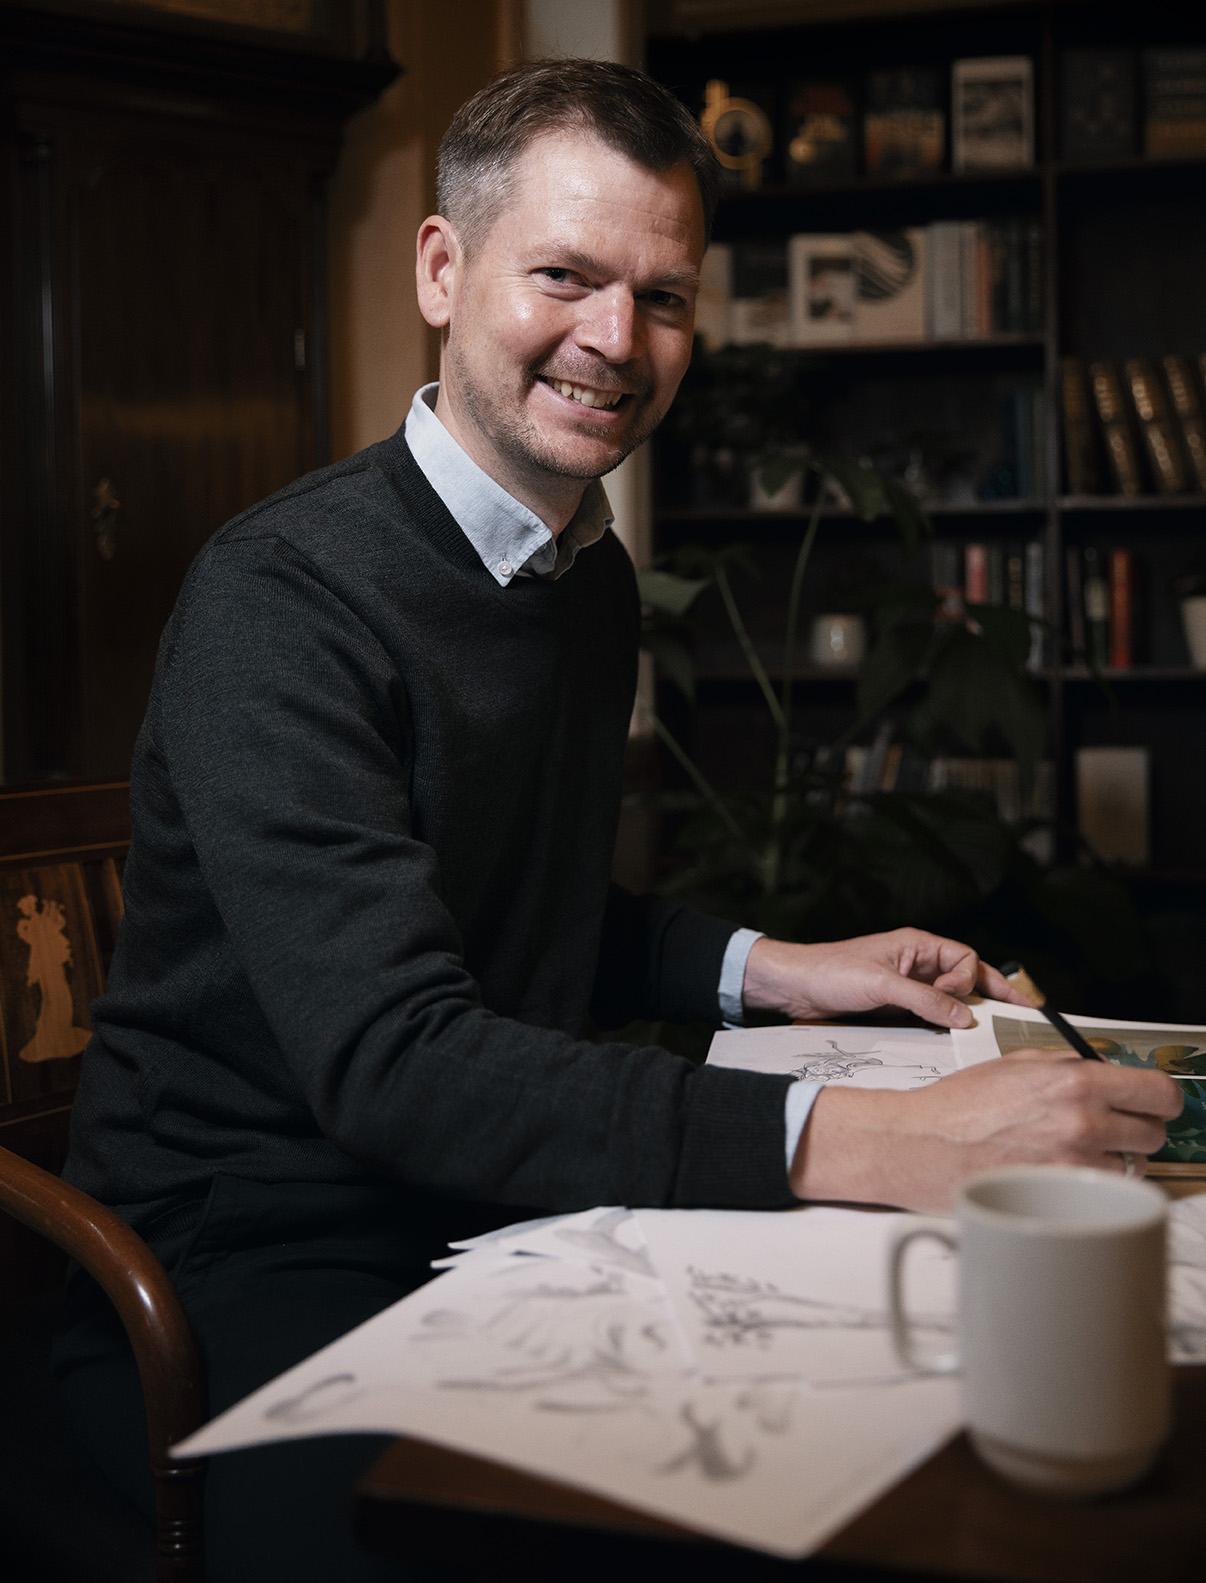 Hans Jørgen Sandnes